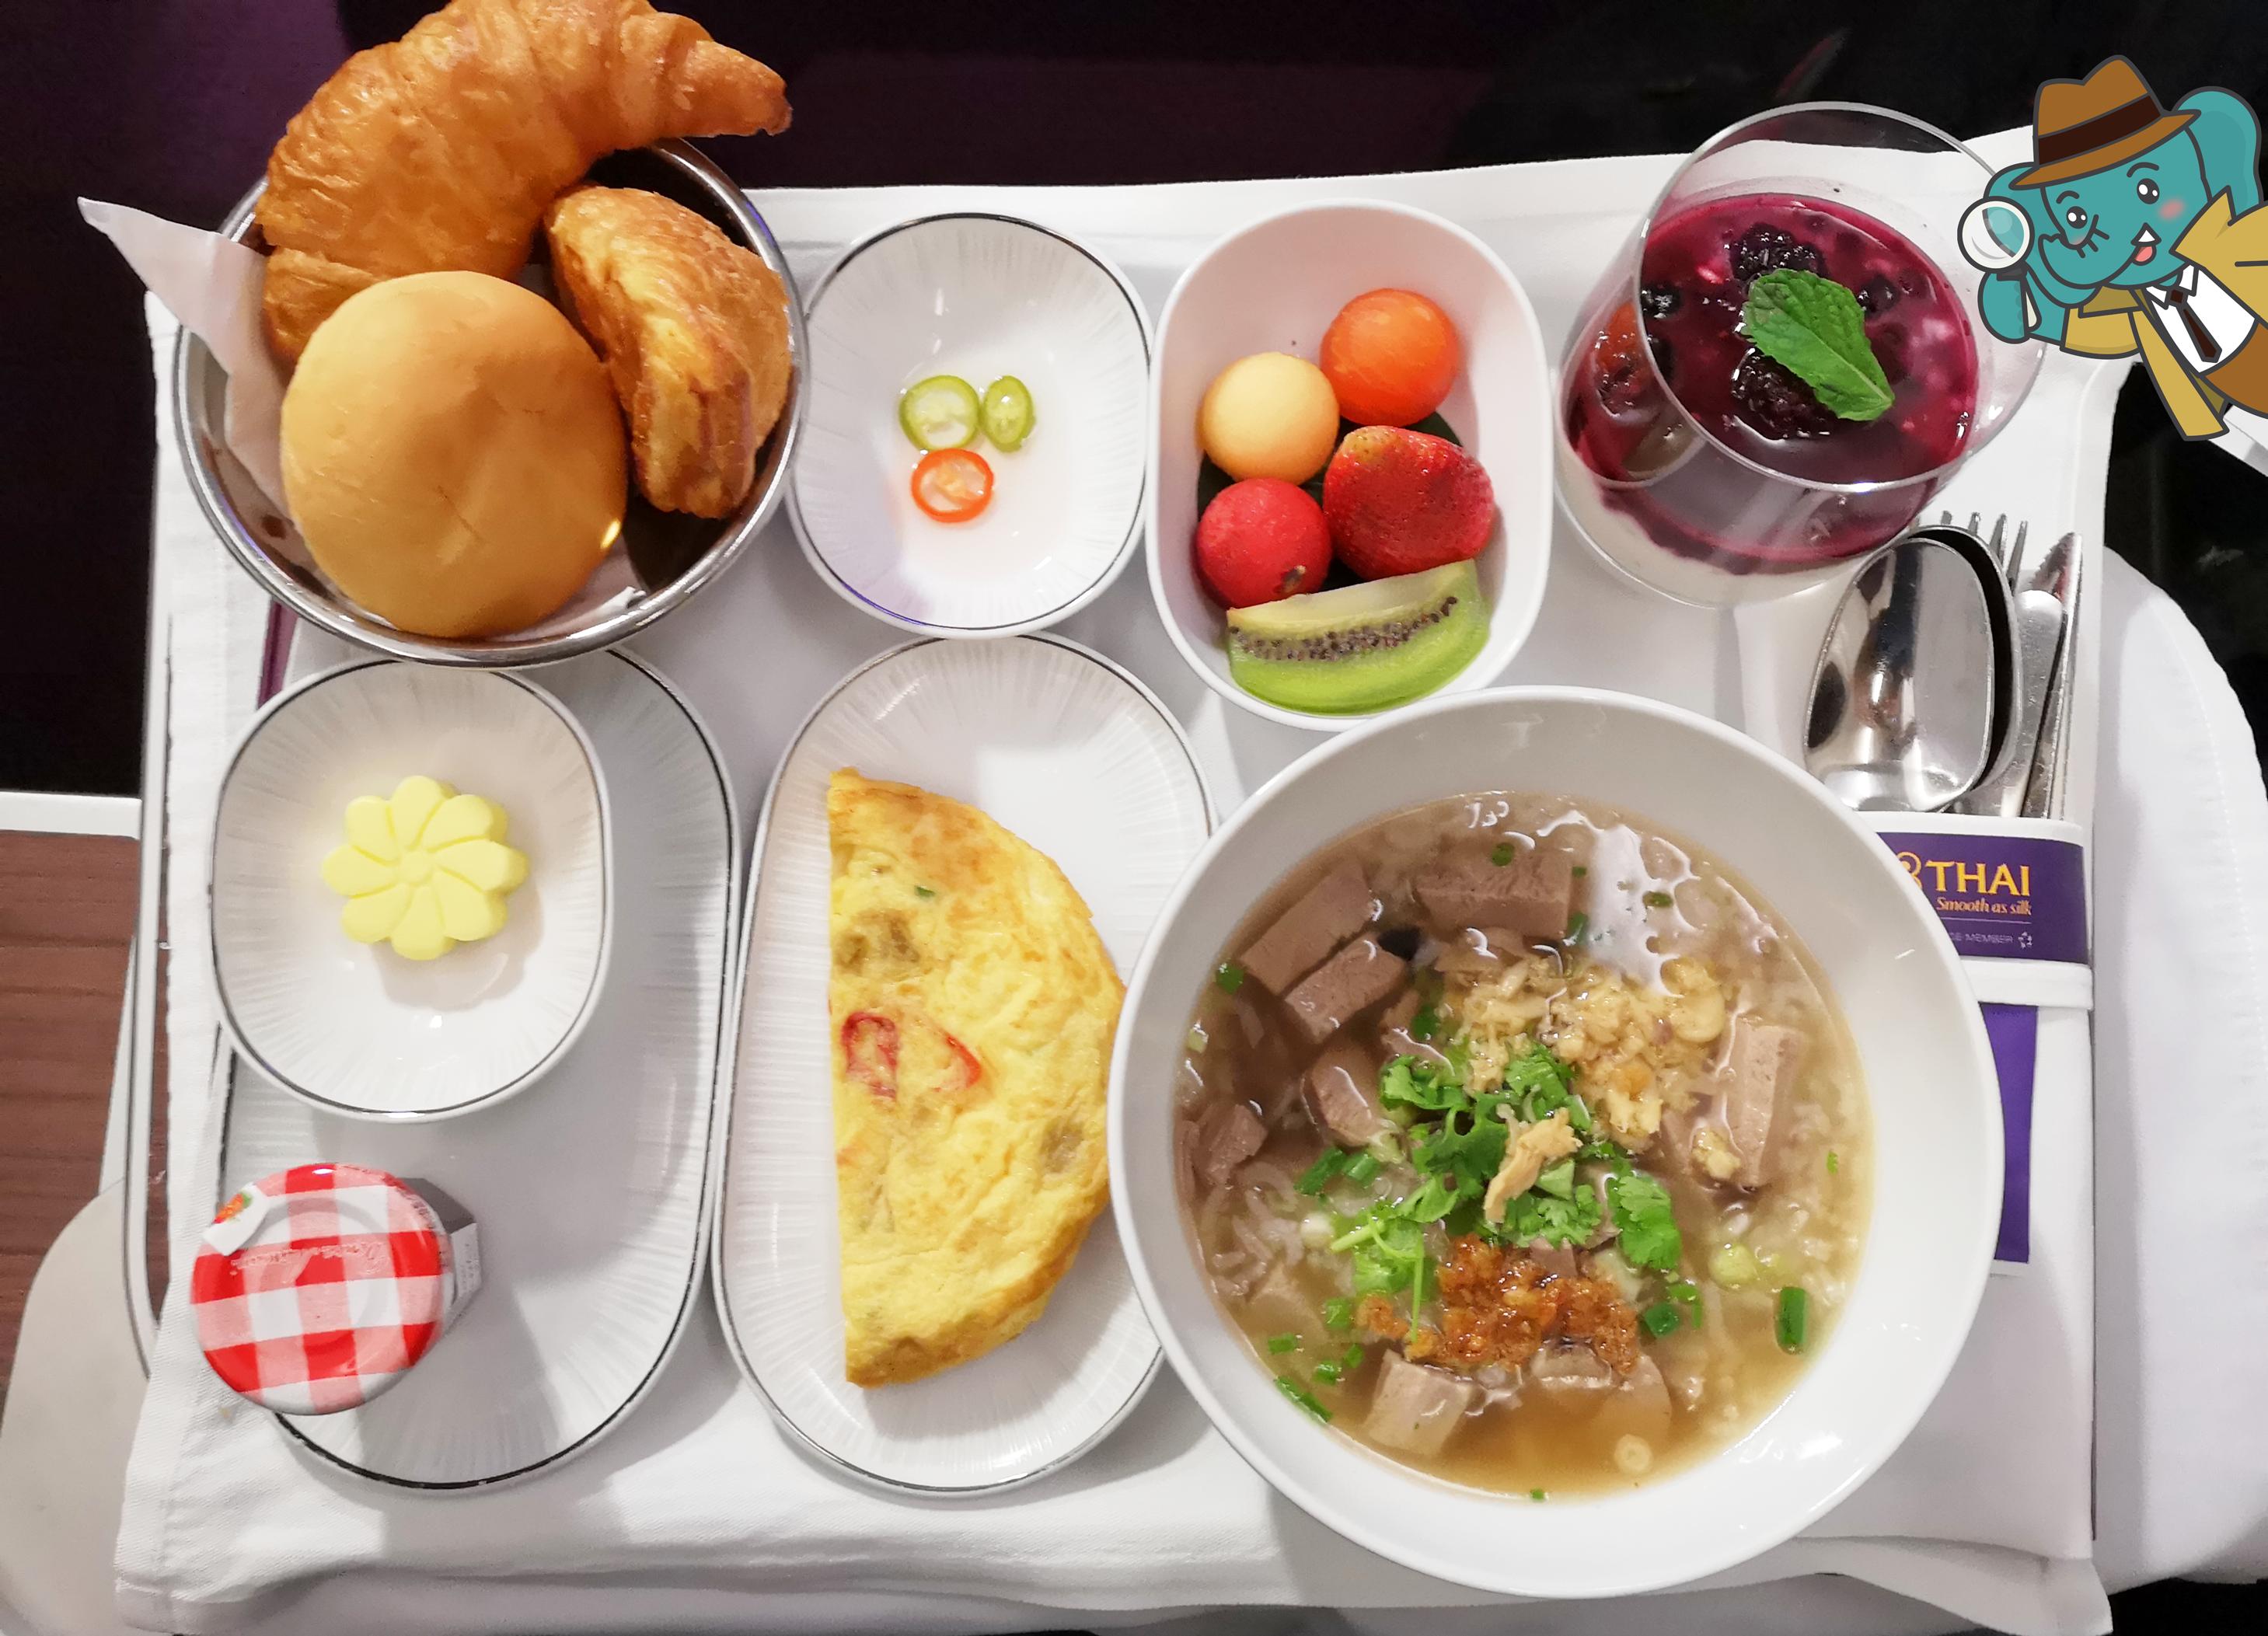 Business Class Thai Airways Food ข้าวต้มเป็ด